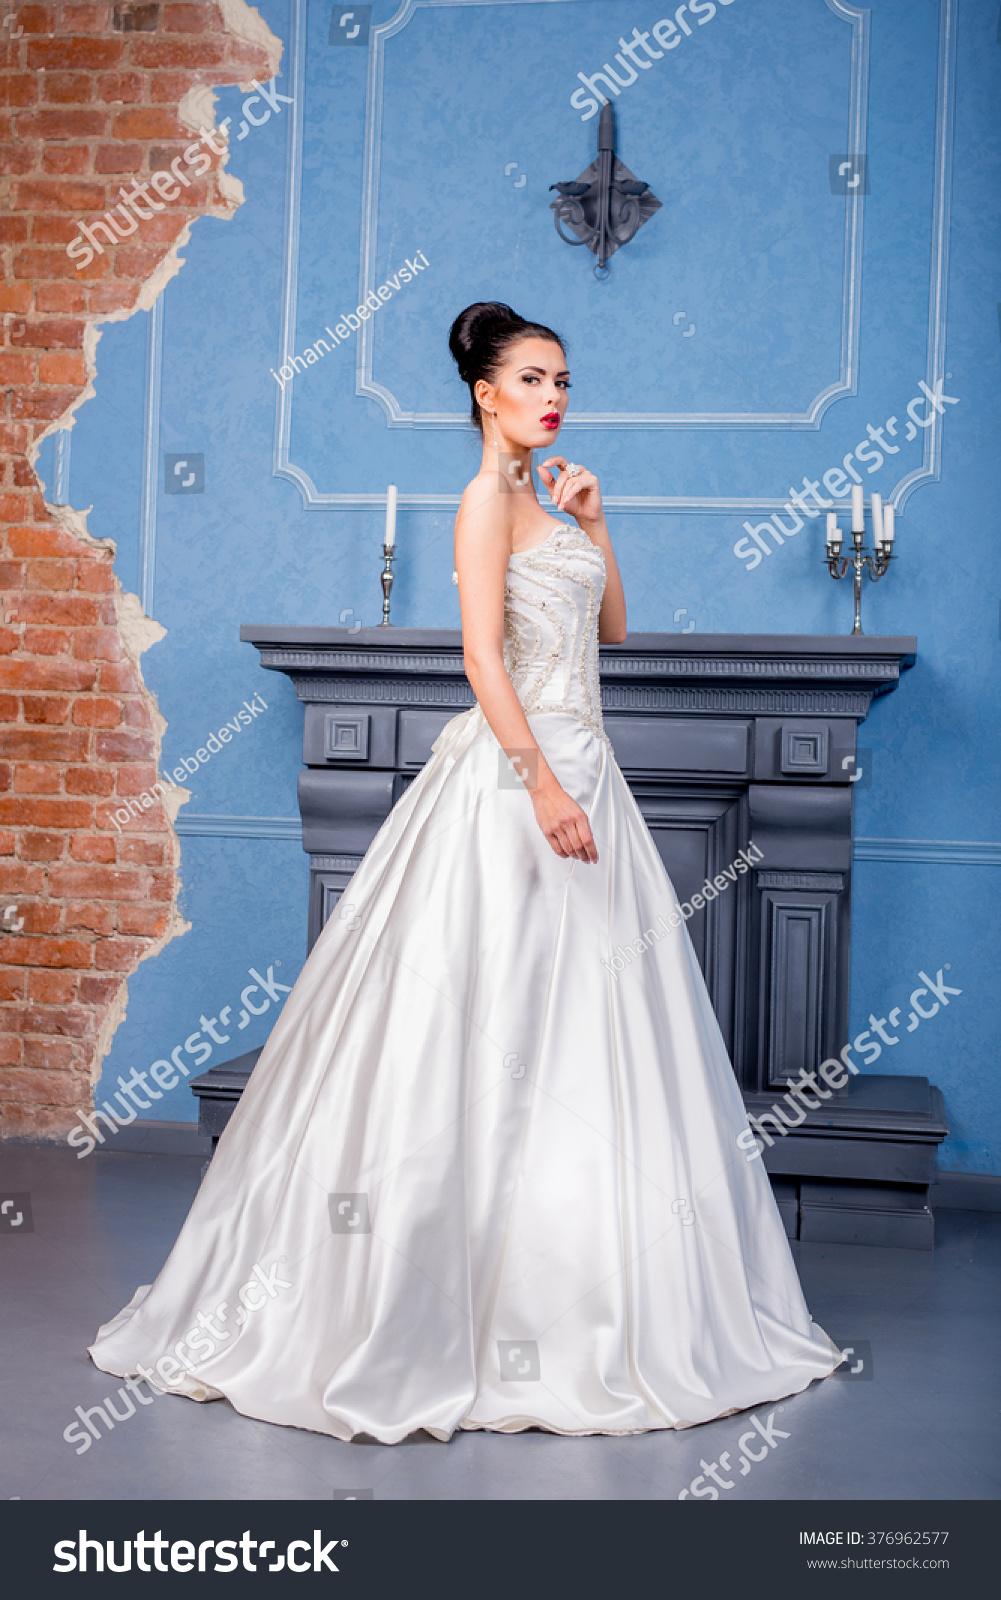 Cool Vintage White Wedding Dress Gallery - Wedding Ideas - memiocall.com